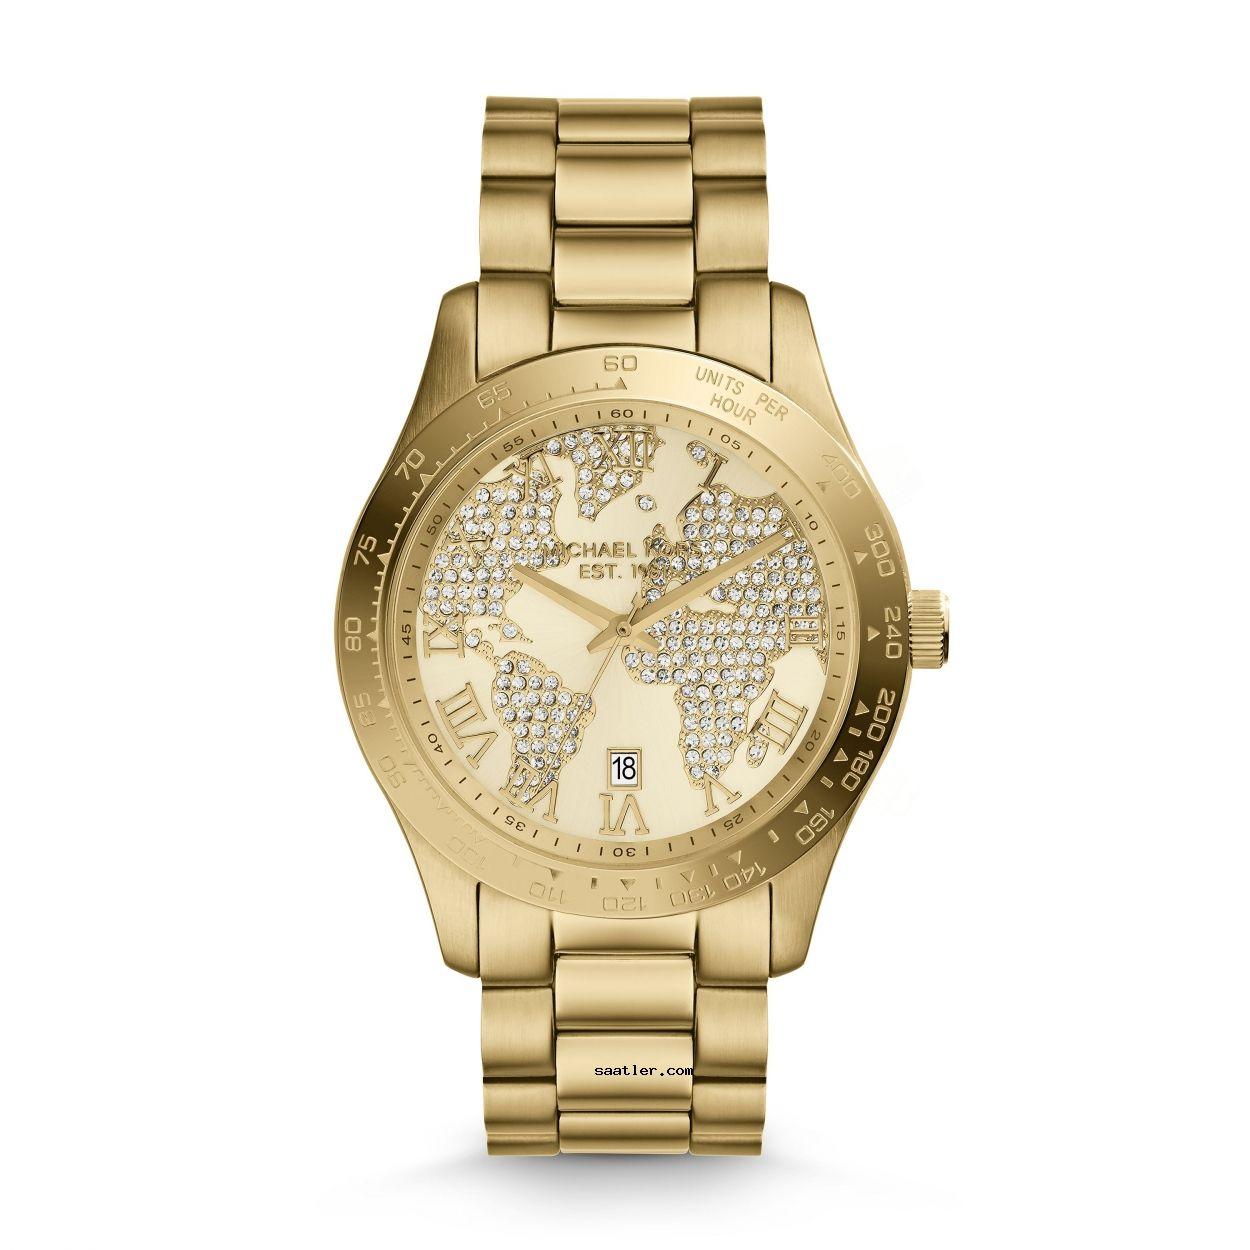 Michael Kors Mk5959 Bayan Kol Saati Watches Women Michael Kors Michael Kors Layton Michael Kors Layton Watch